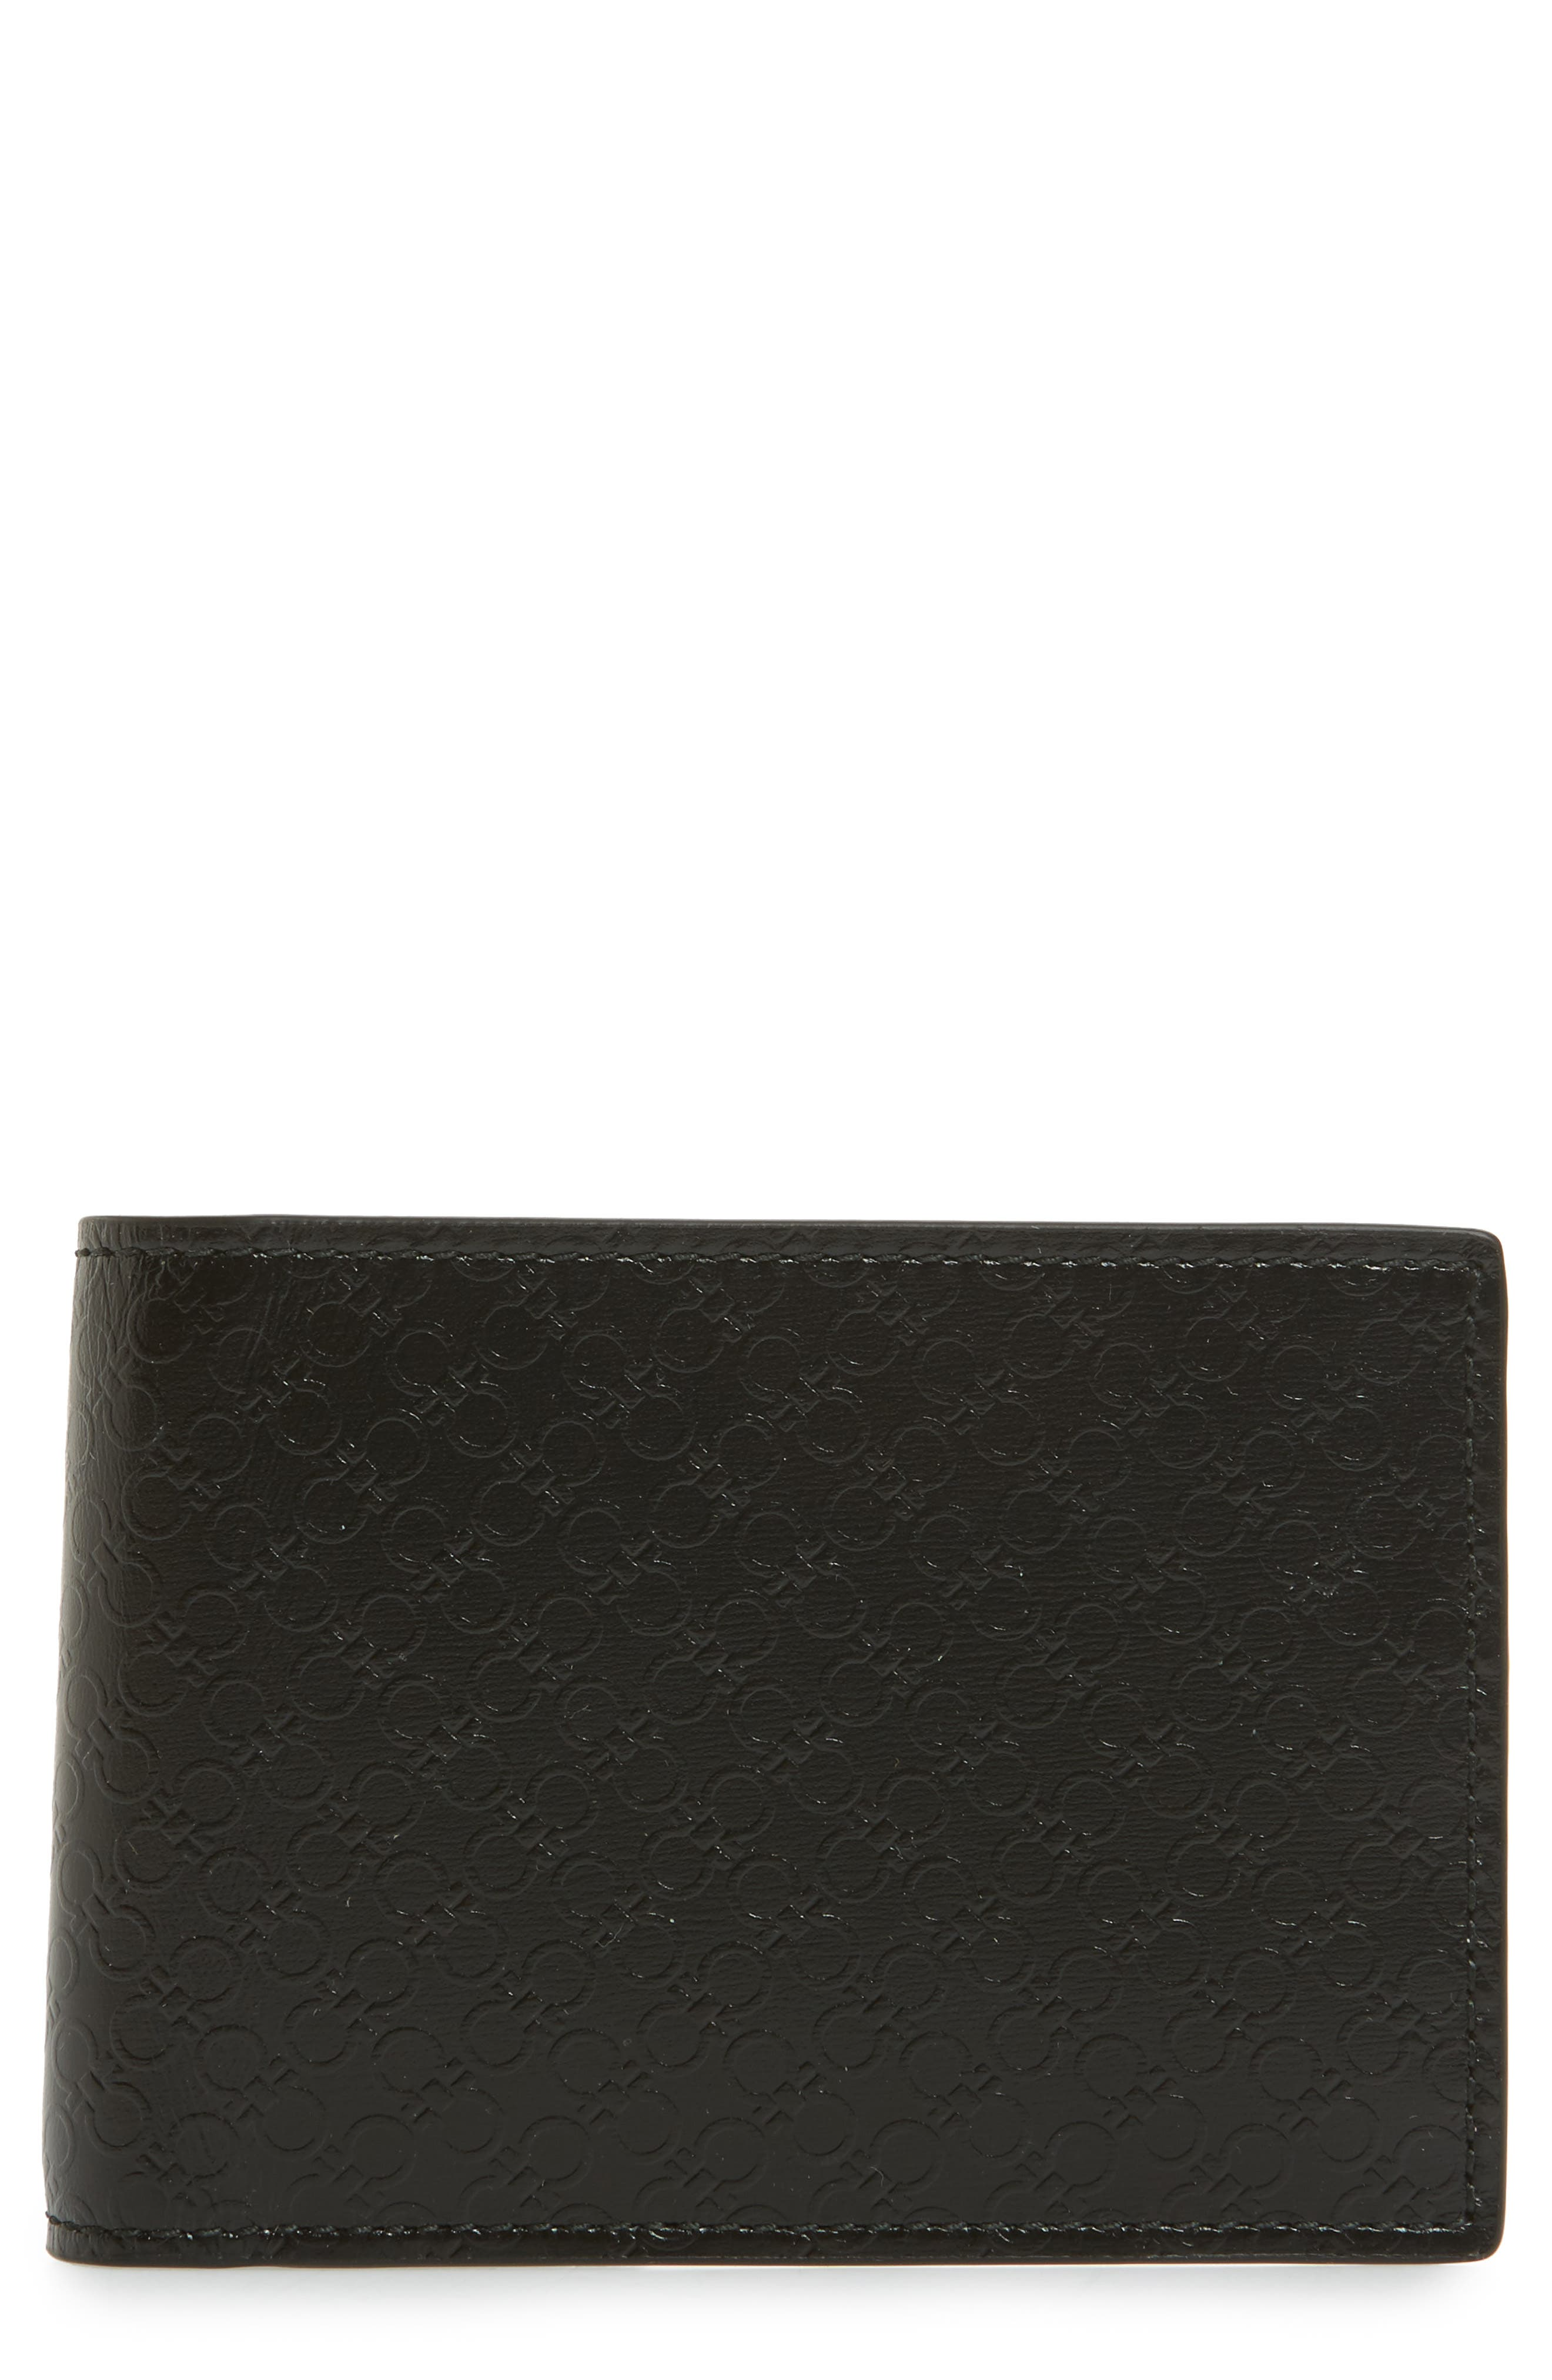 Main Image - Salvatore Ferragamo Gancini Leather Card Case